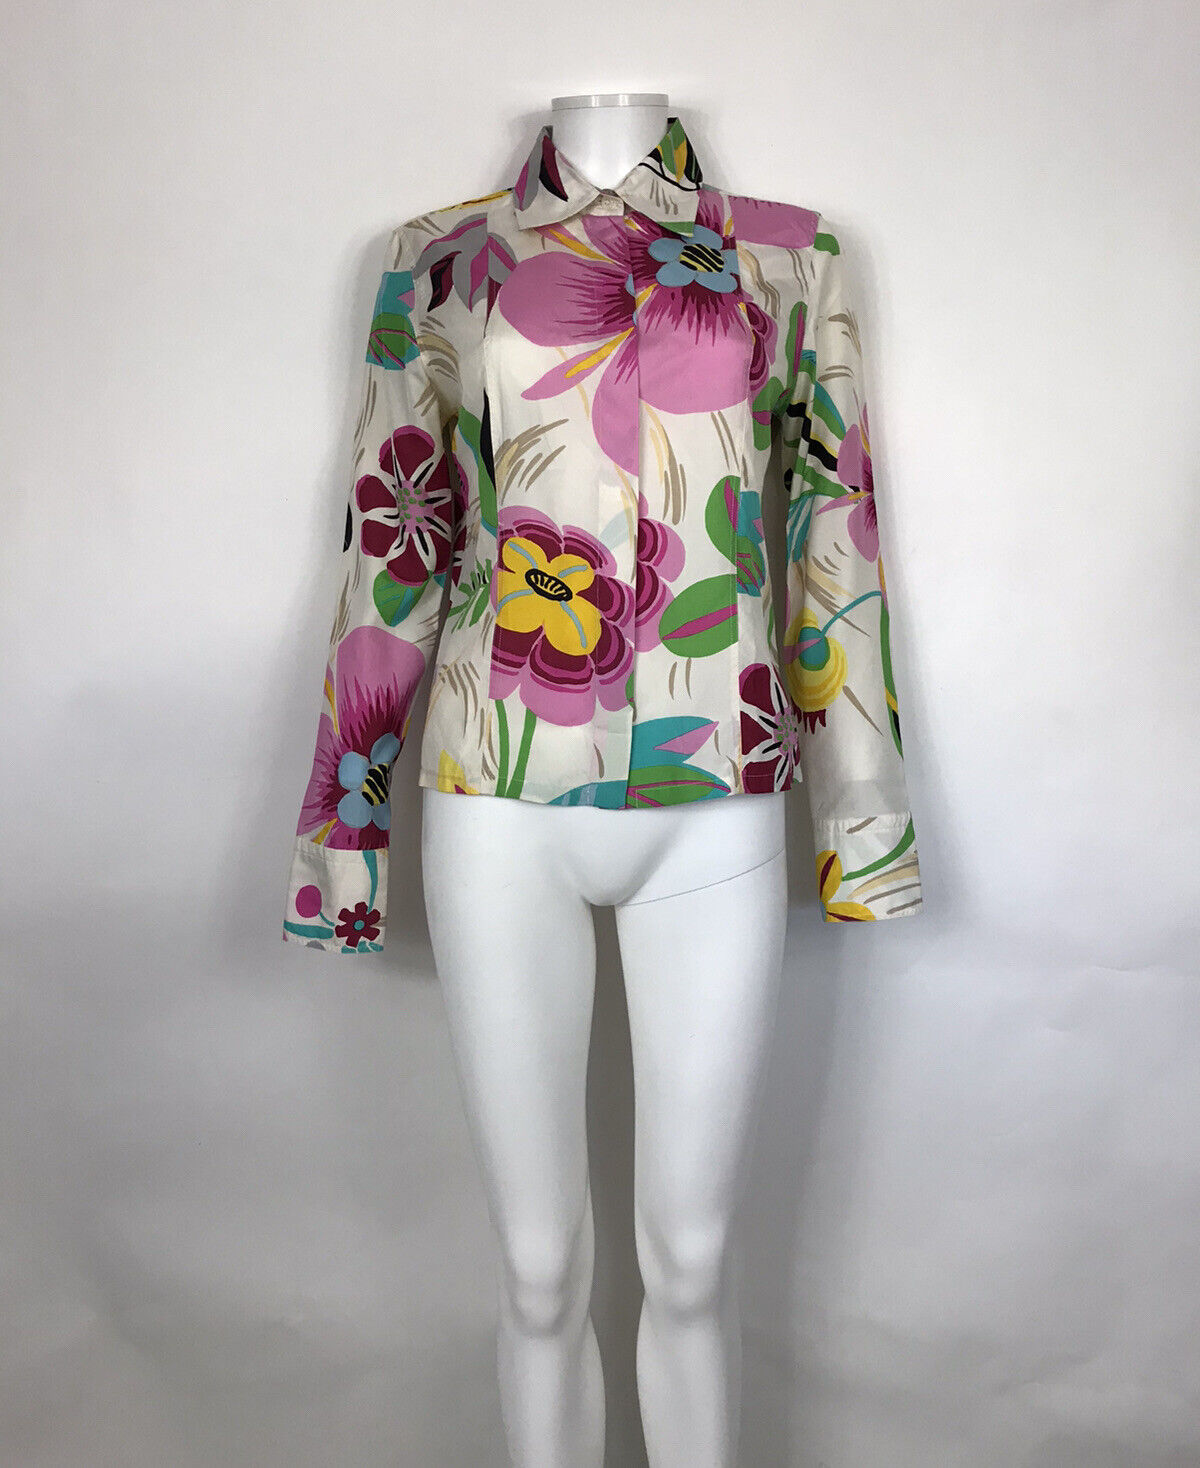 Rare Vtg Gucci White Floral Print Silk Top S - image 1